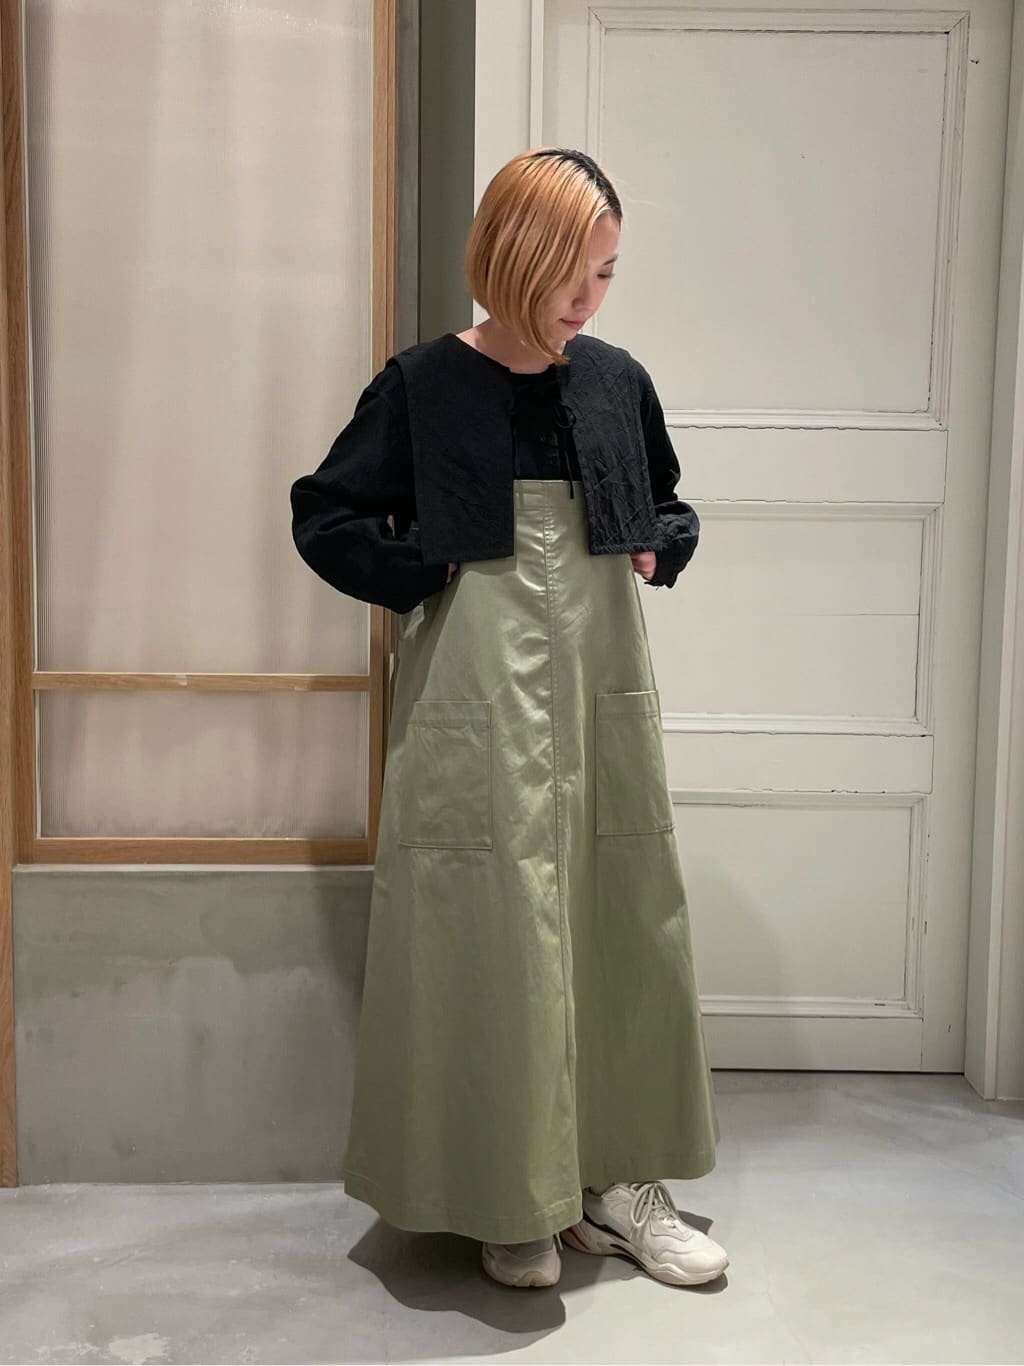 bulle de savon 渋谷スクランブルスクエア 身長:154cm 2021.08.13